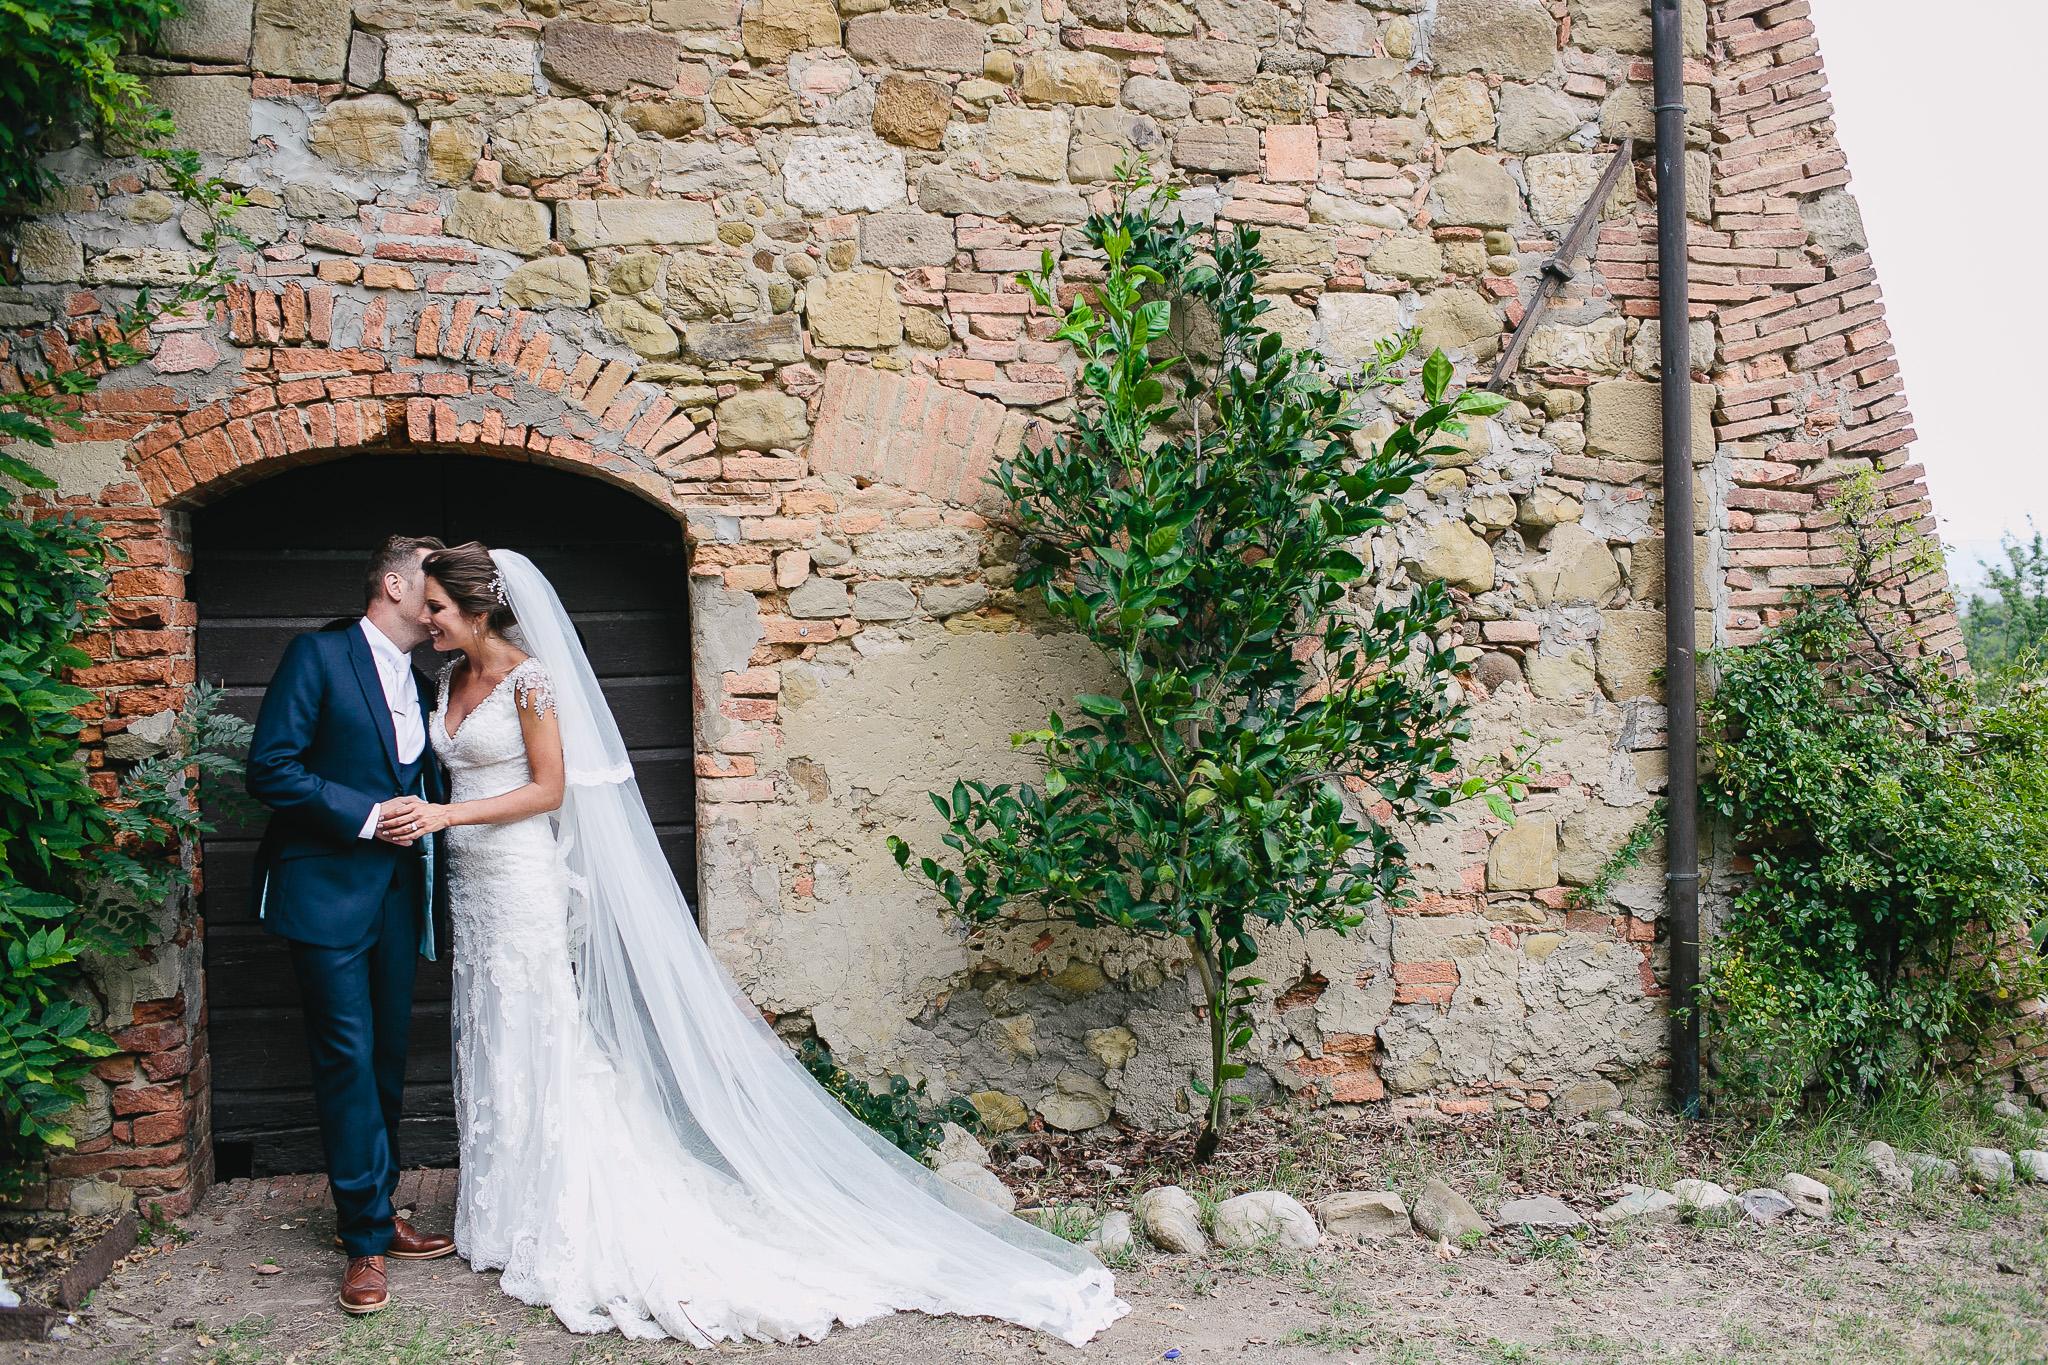 pieve de pitti wedding